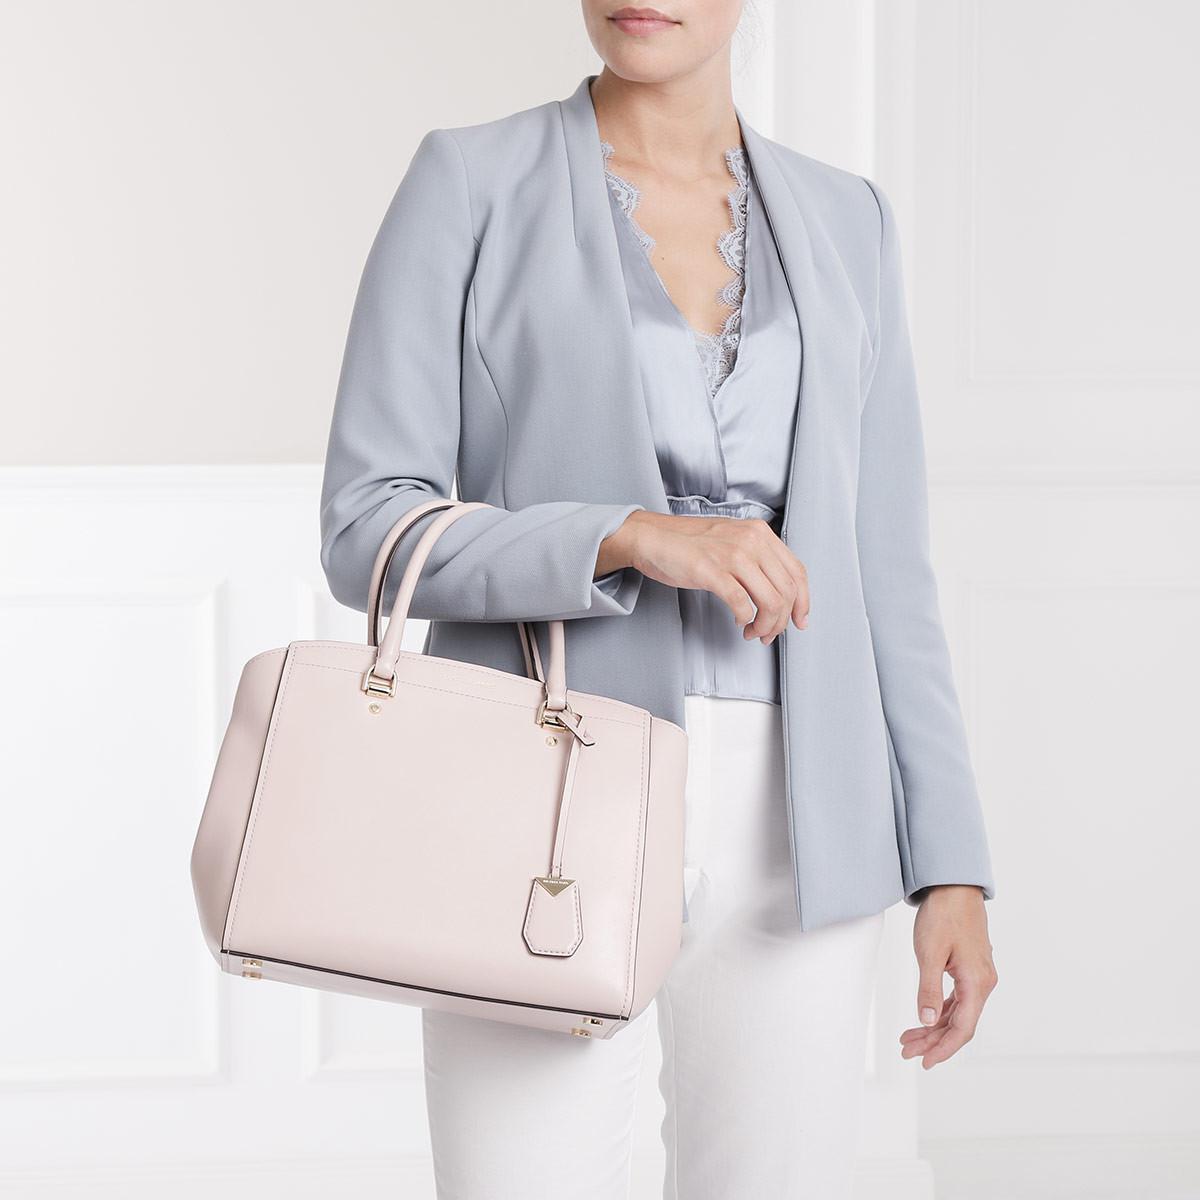 c2eea5903aae9 Michael Kors - Benning Lg Satchel Bag Soft Pink - Lyst. View fullscreen